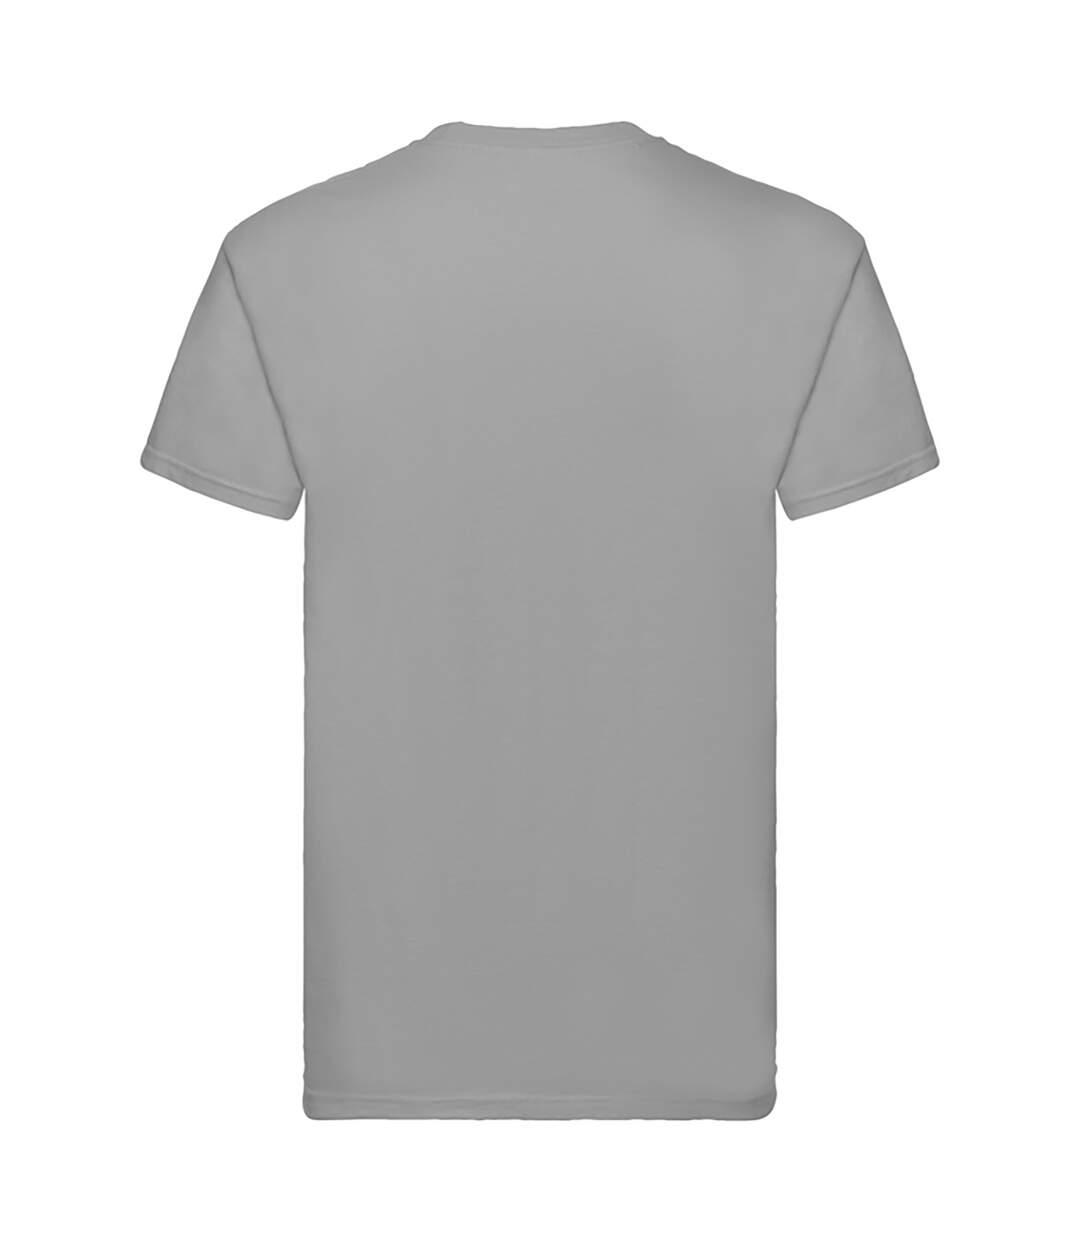 Fruit Of The Loom Mens Super Premium Short Sleeve Crew Neck T-Shirt (Ash Grey) - UTBC333